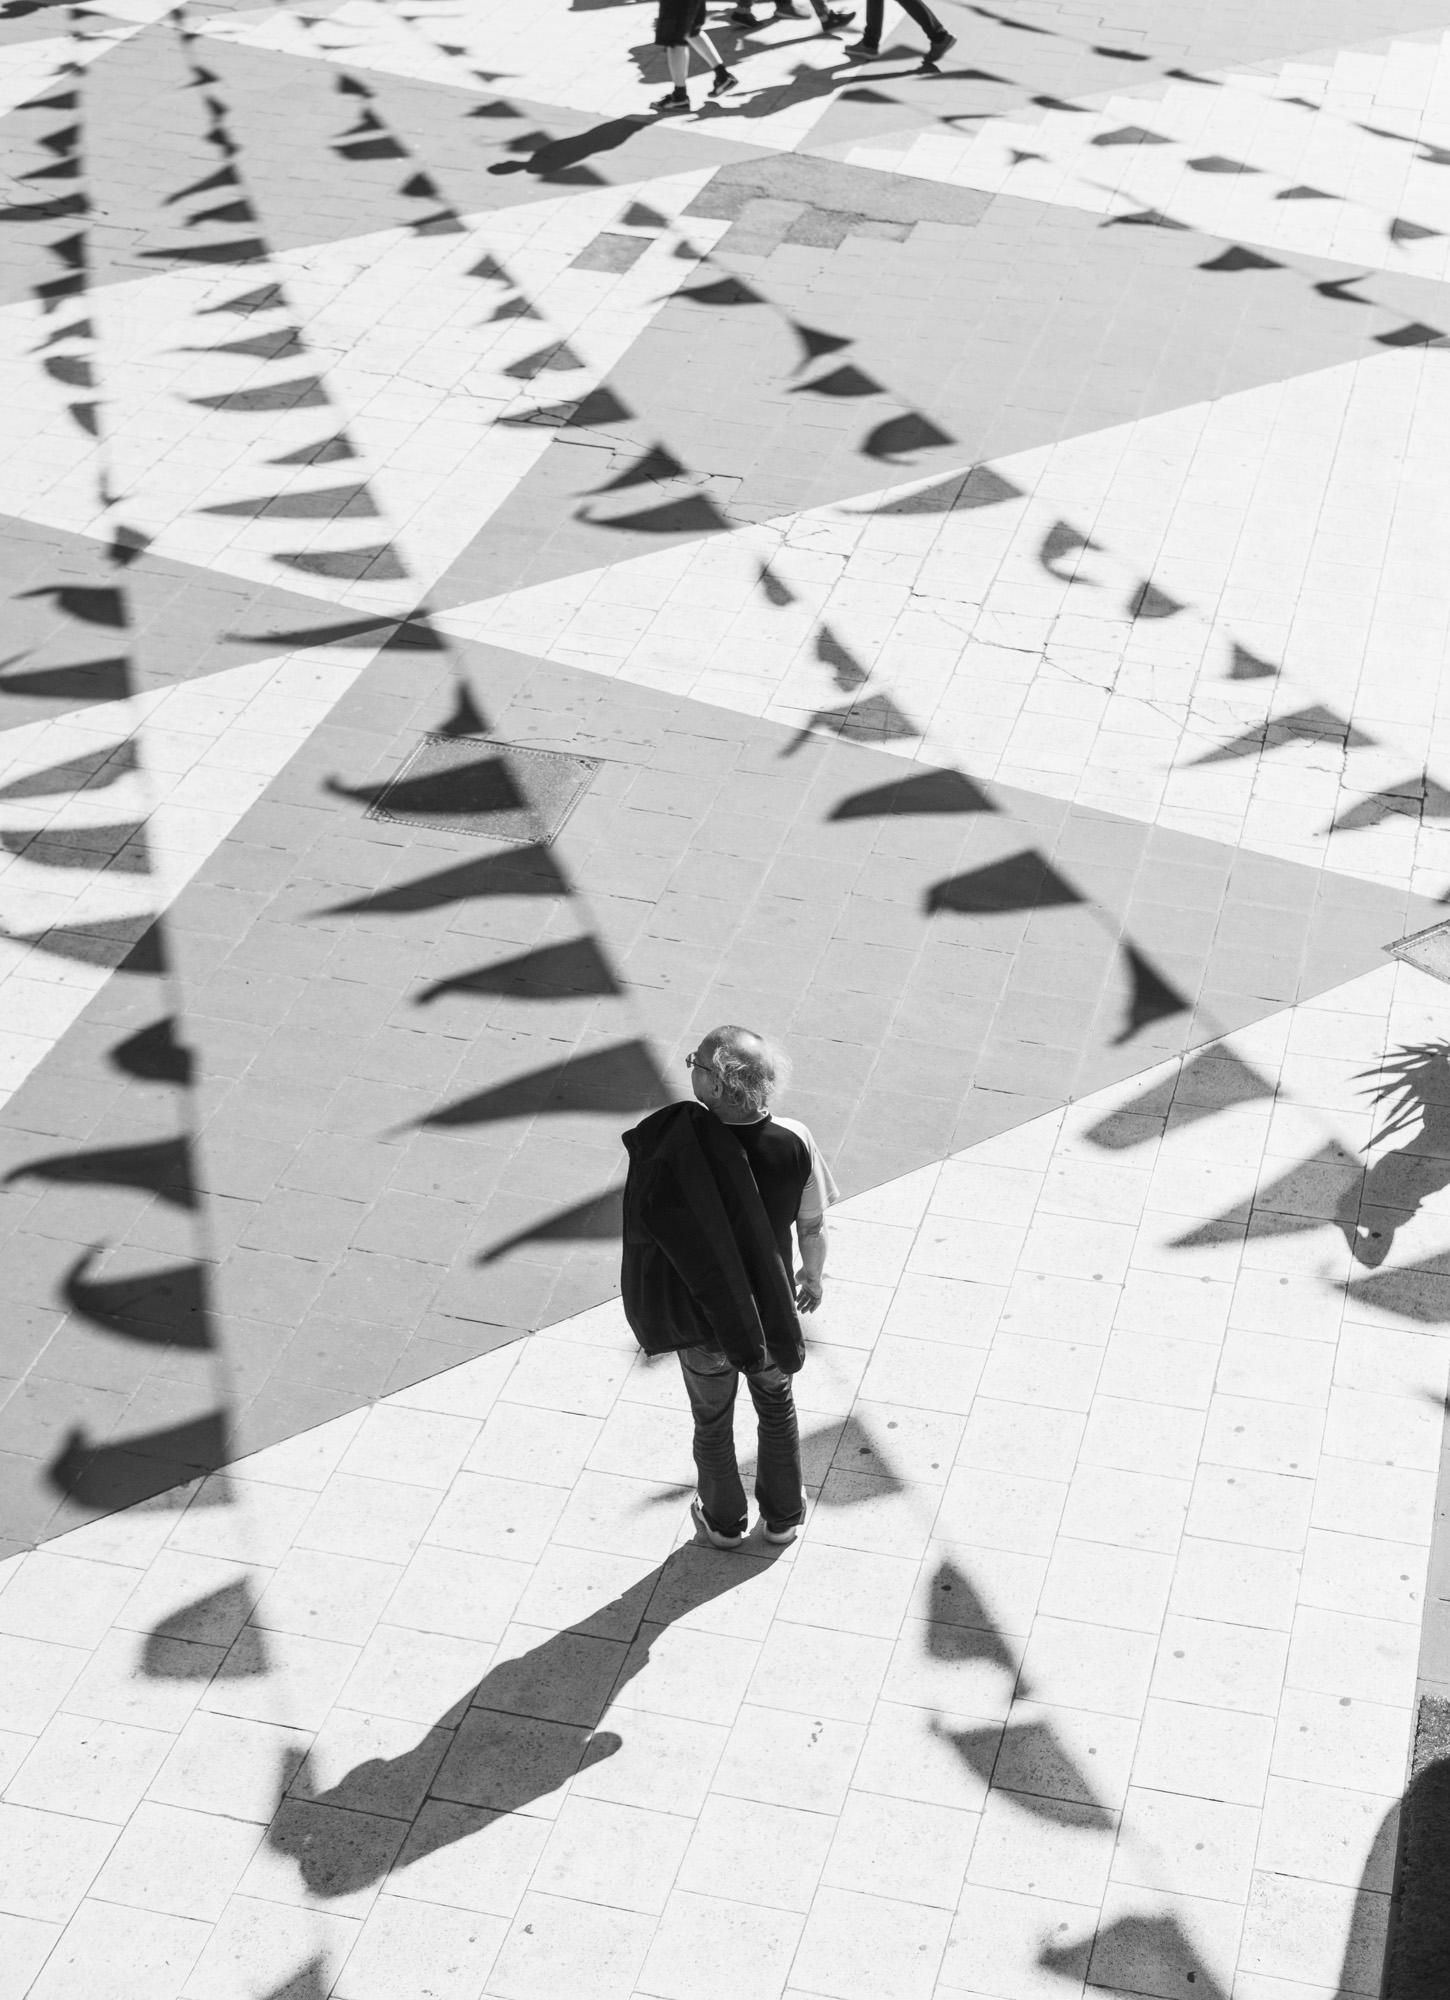 092119_FredrikBengtsson-Copyright_1622